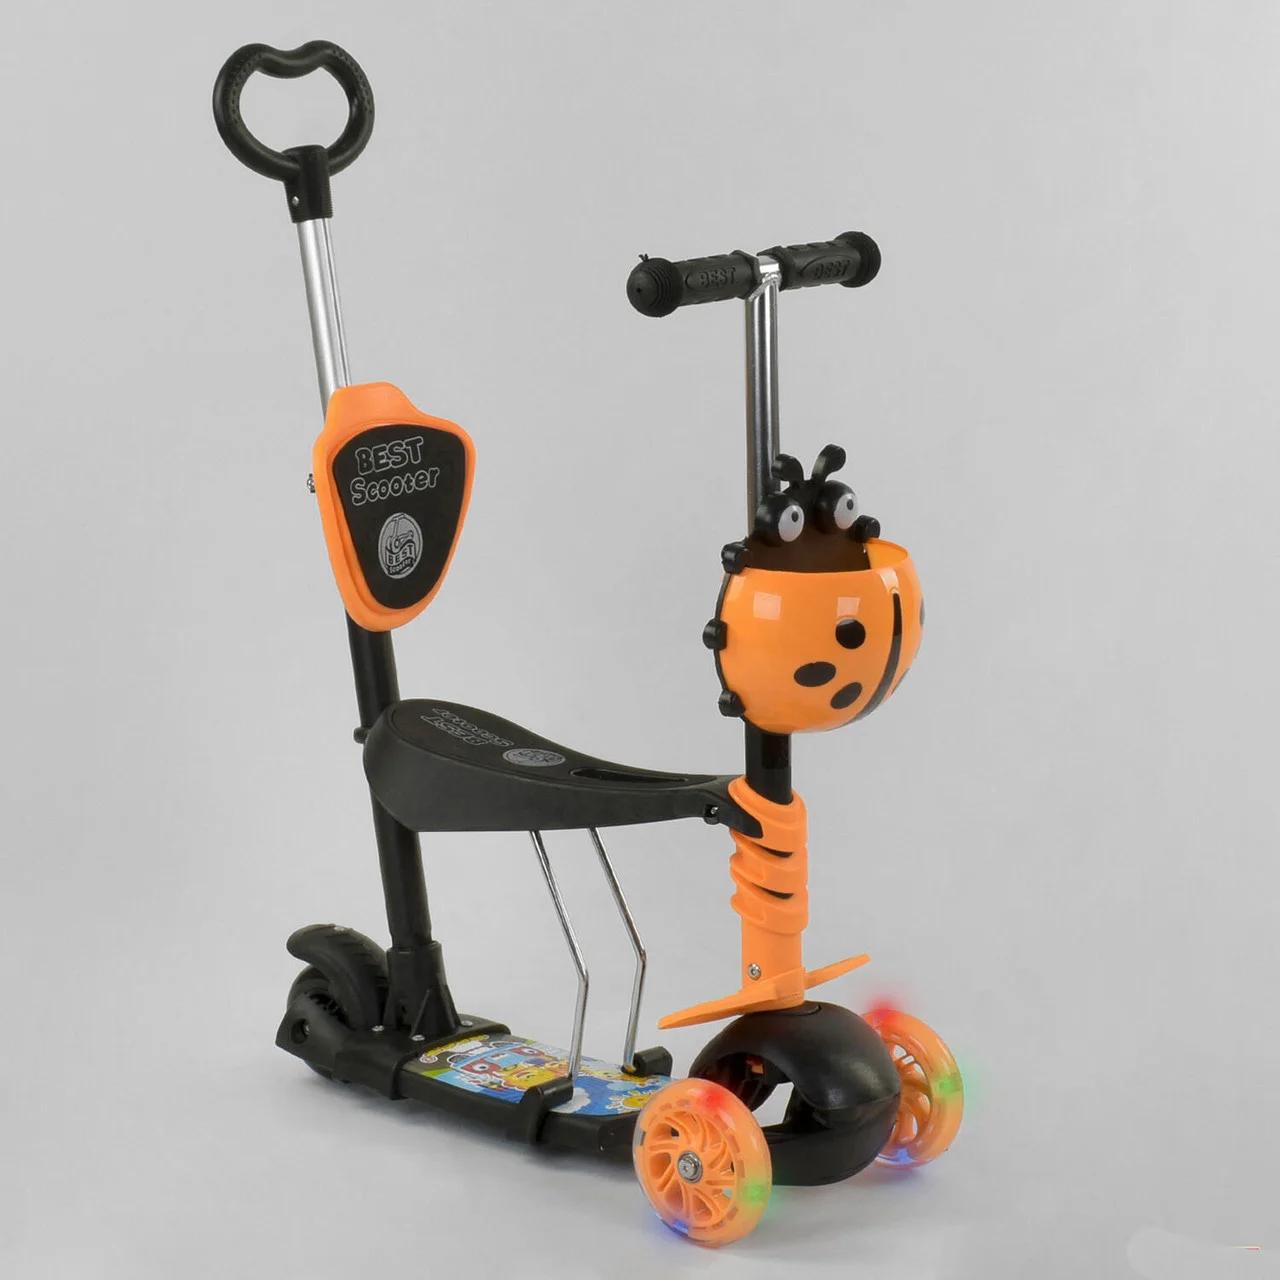 Самокат 5в1  Best Scooter 78266, чёрно-оранжевый, PU колеса, подсветка колёс